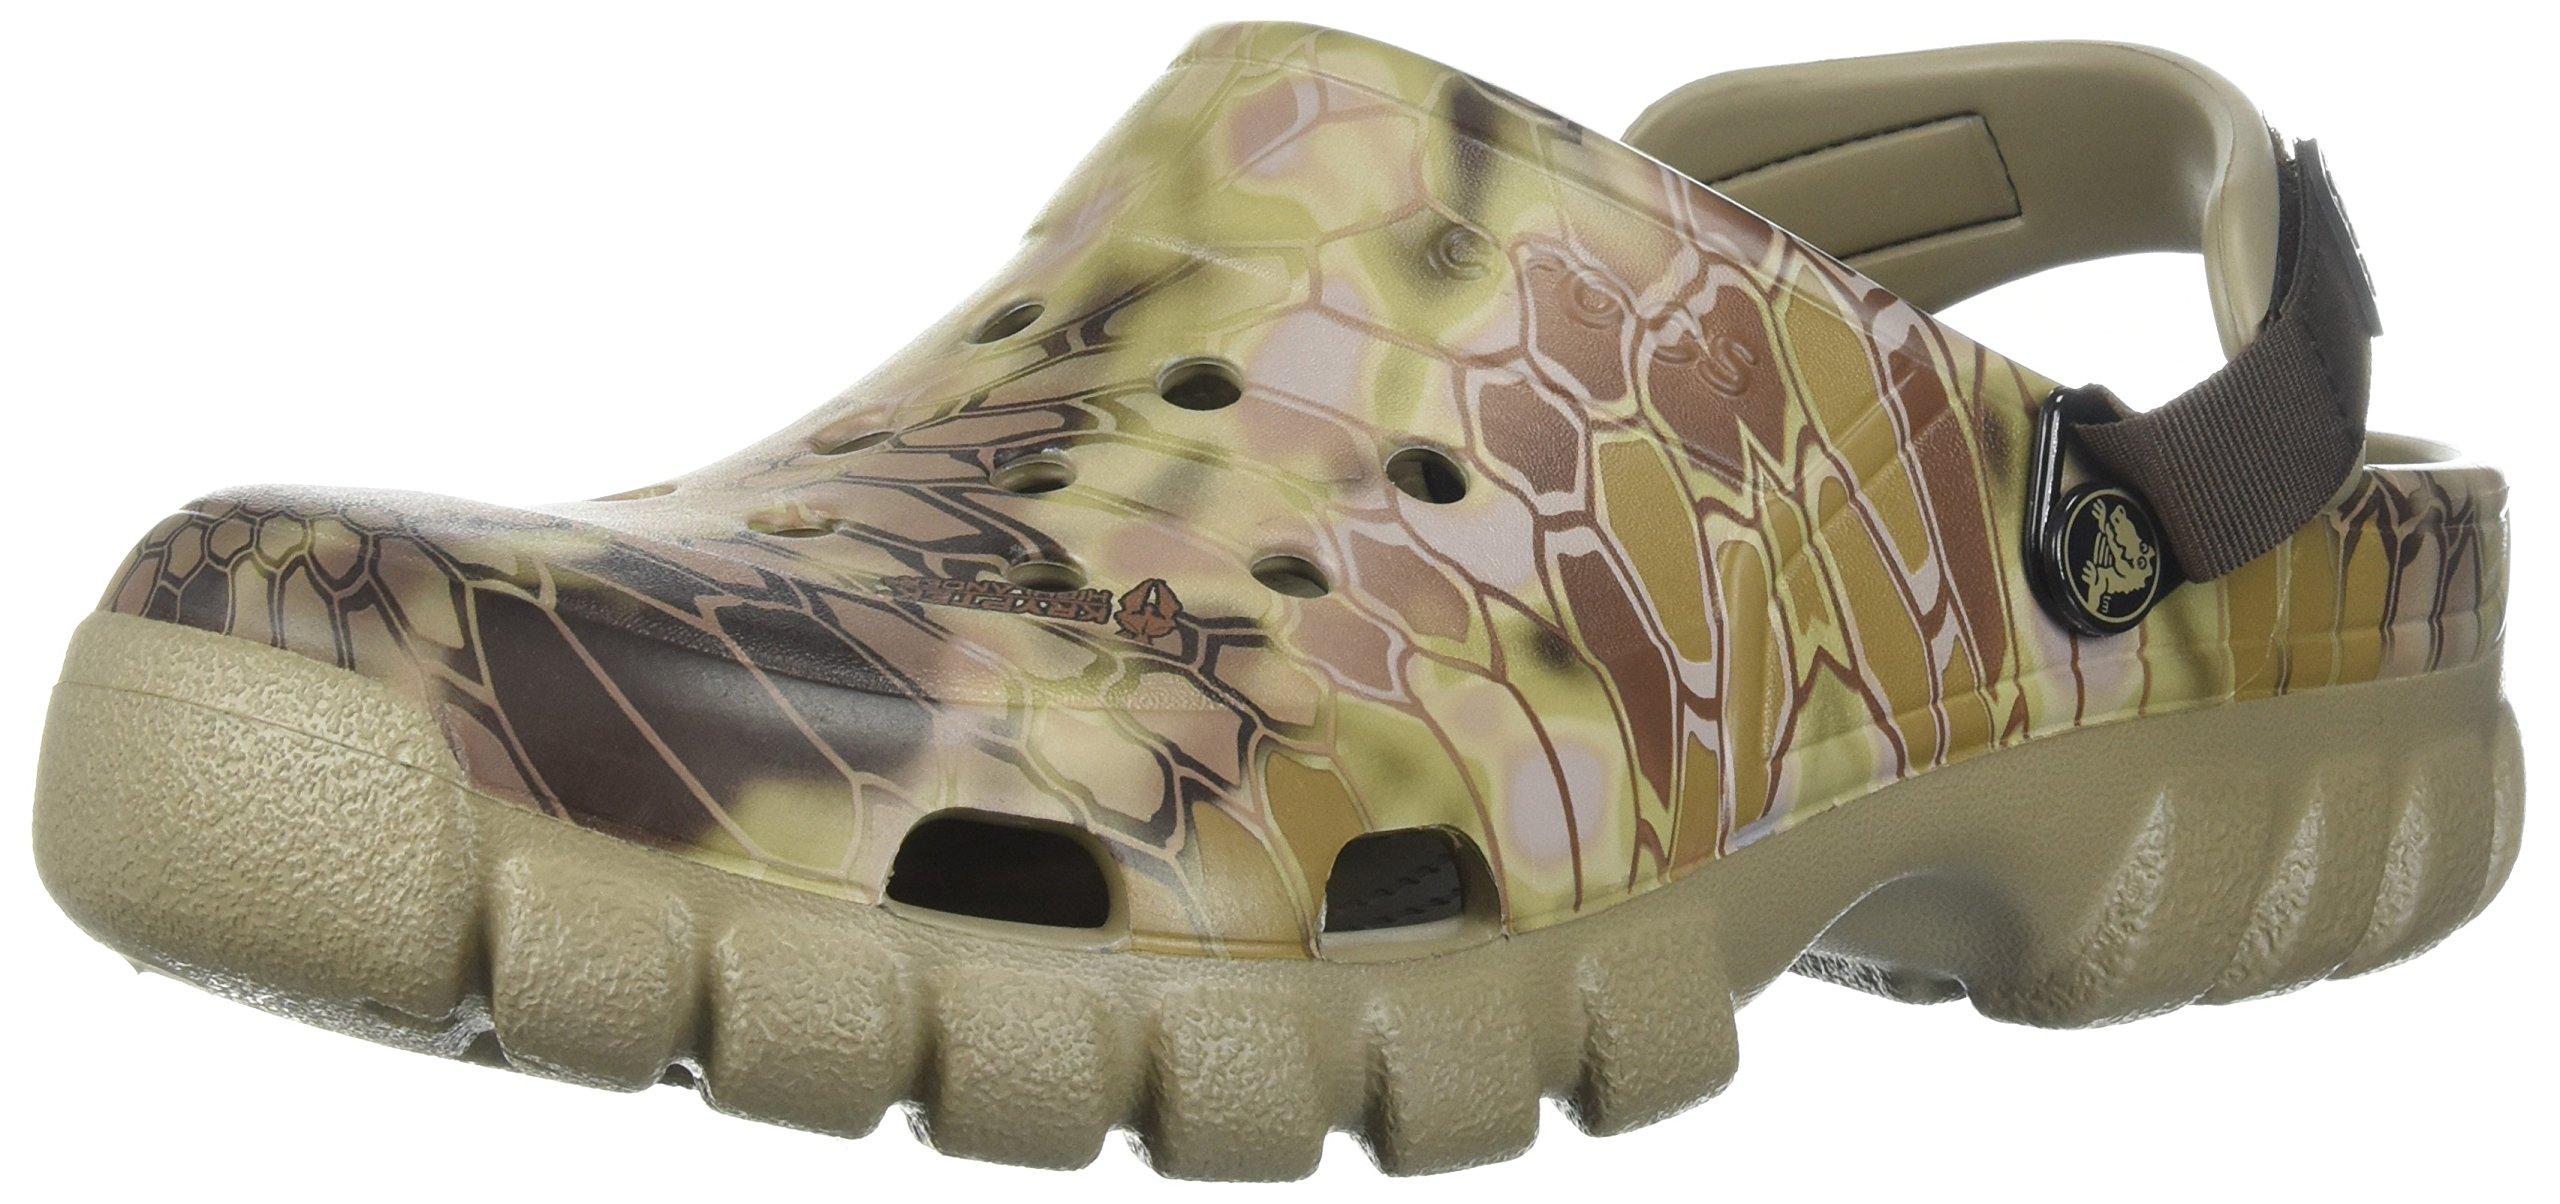 Crocs Or Sport Kryptek Hghlander CLG Clog, Khaki, 10 US Men/12 US Women M US by Crocs